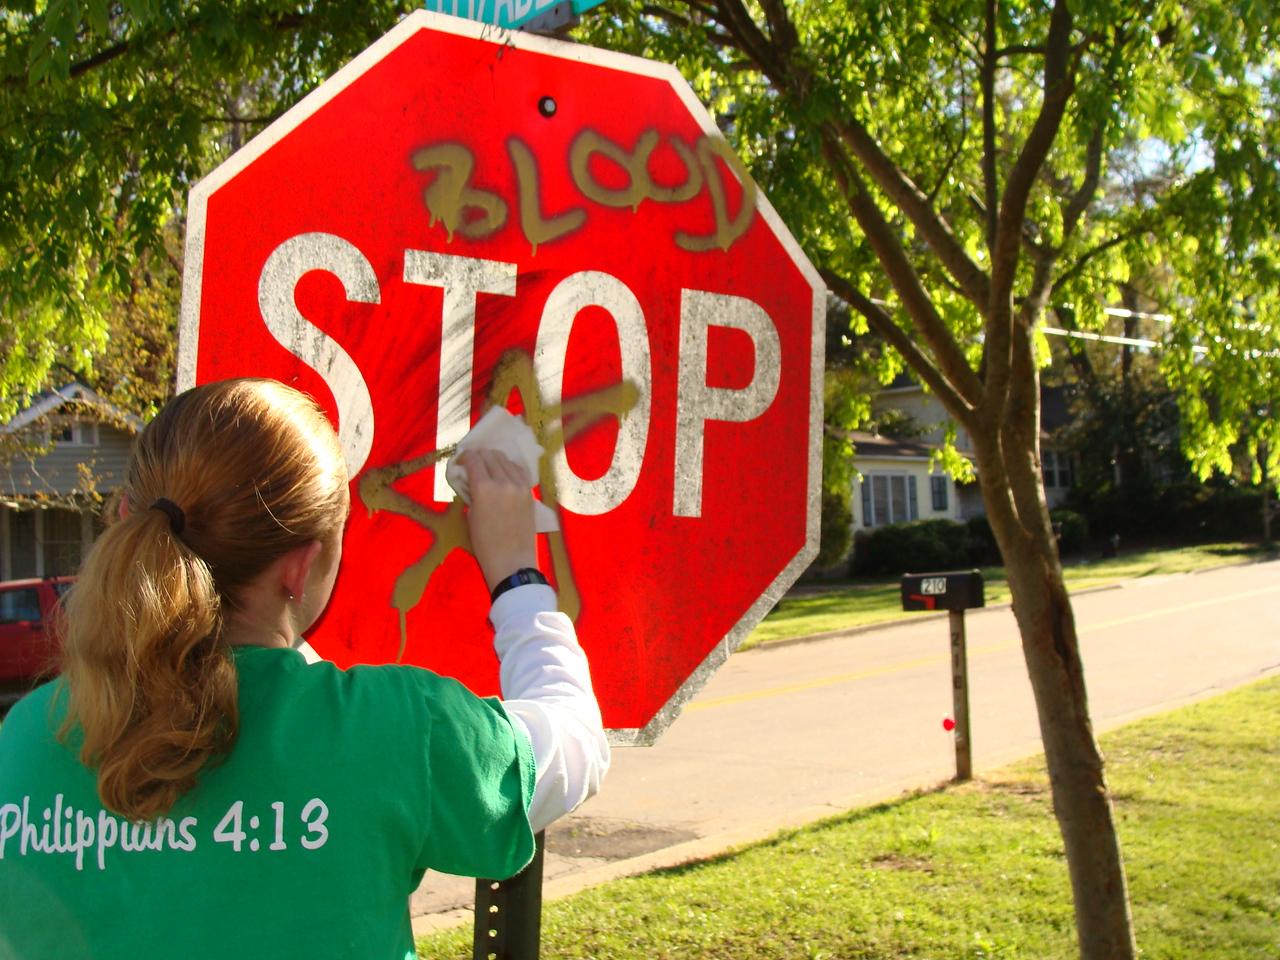 09 03-28 Removing gang markings near Chuck Davis lot. klb